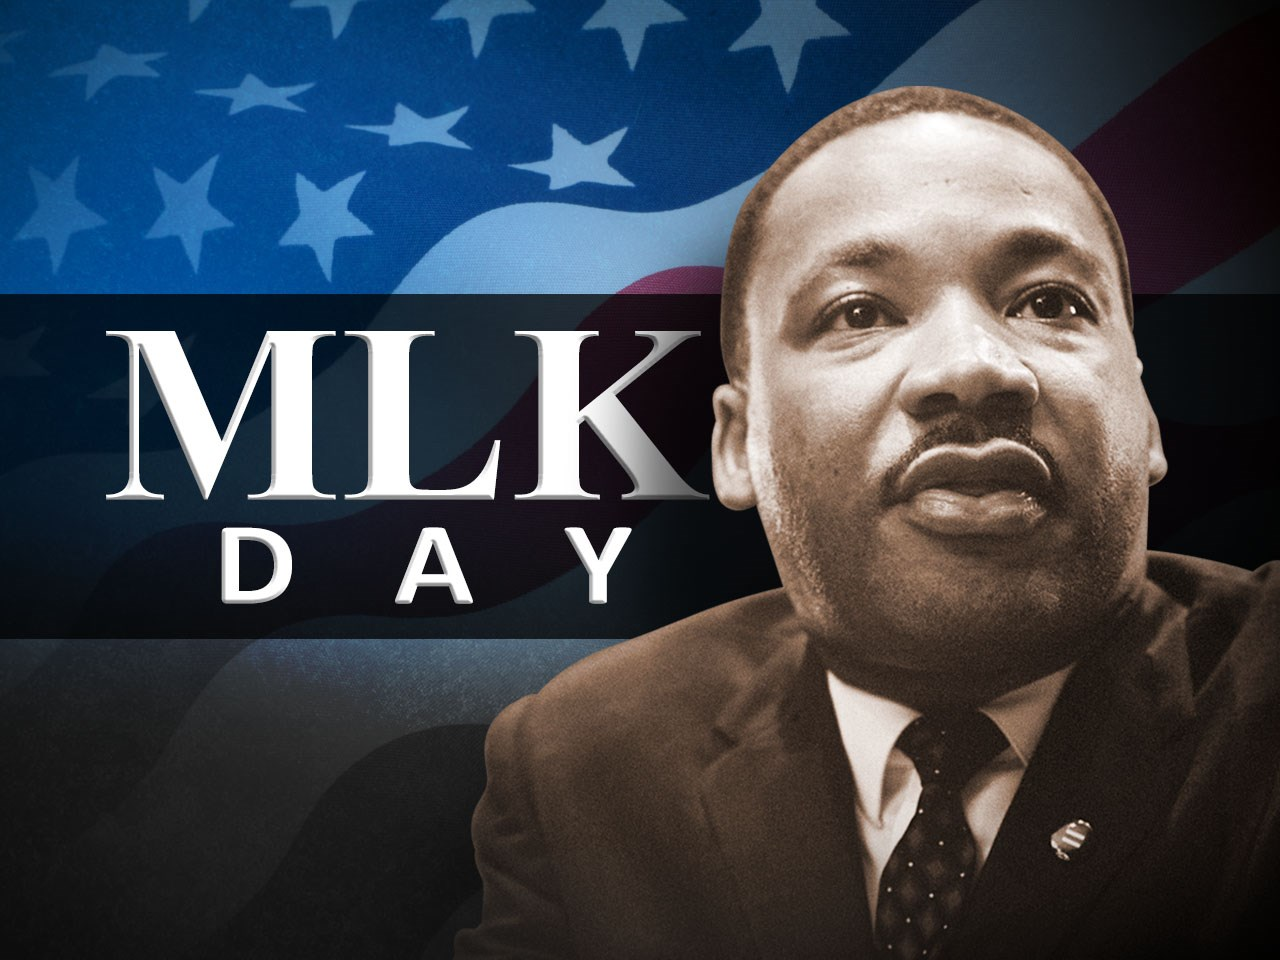 MLK DAY_1516023490473.jpg.jpg